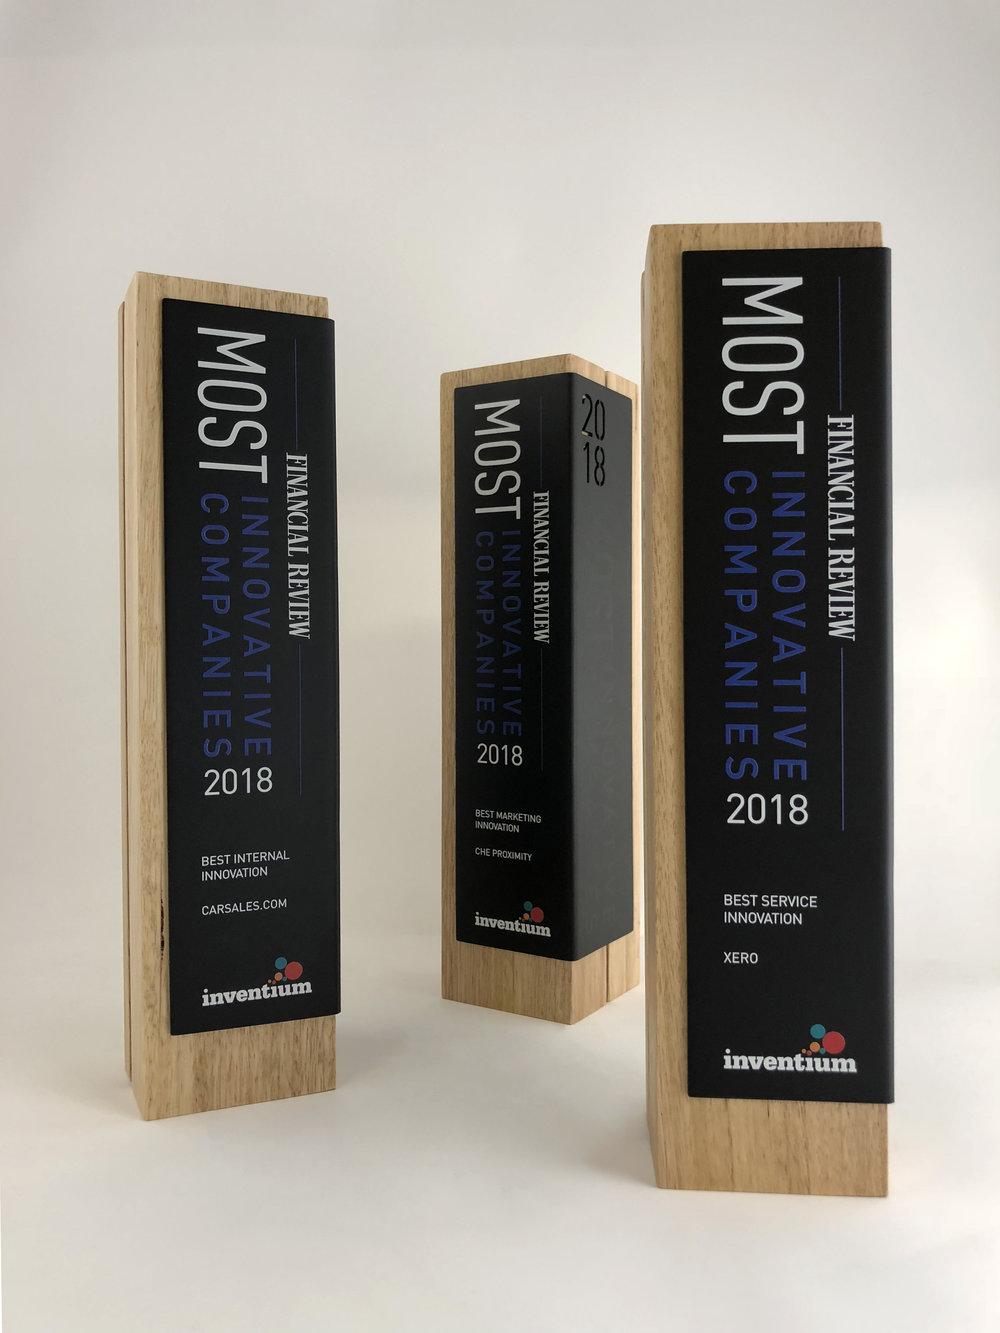 most-innovative-companies-awards-timber-metal-trophy-06.jpg